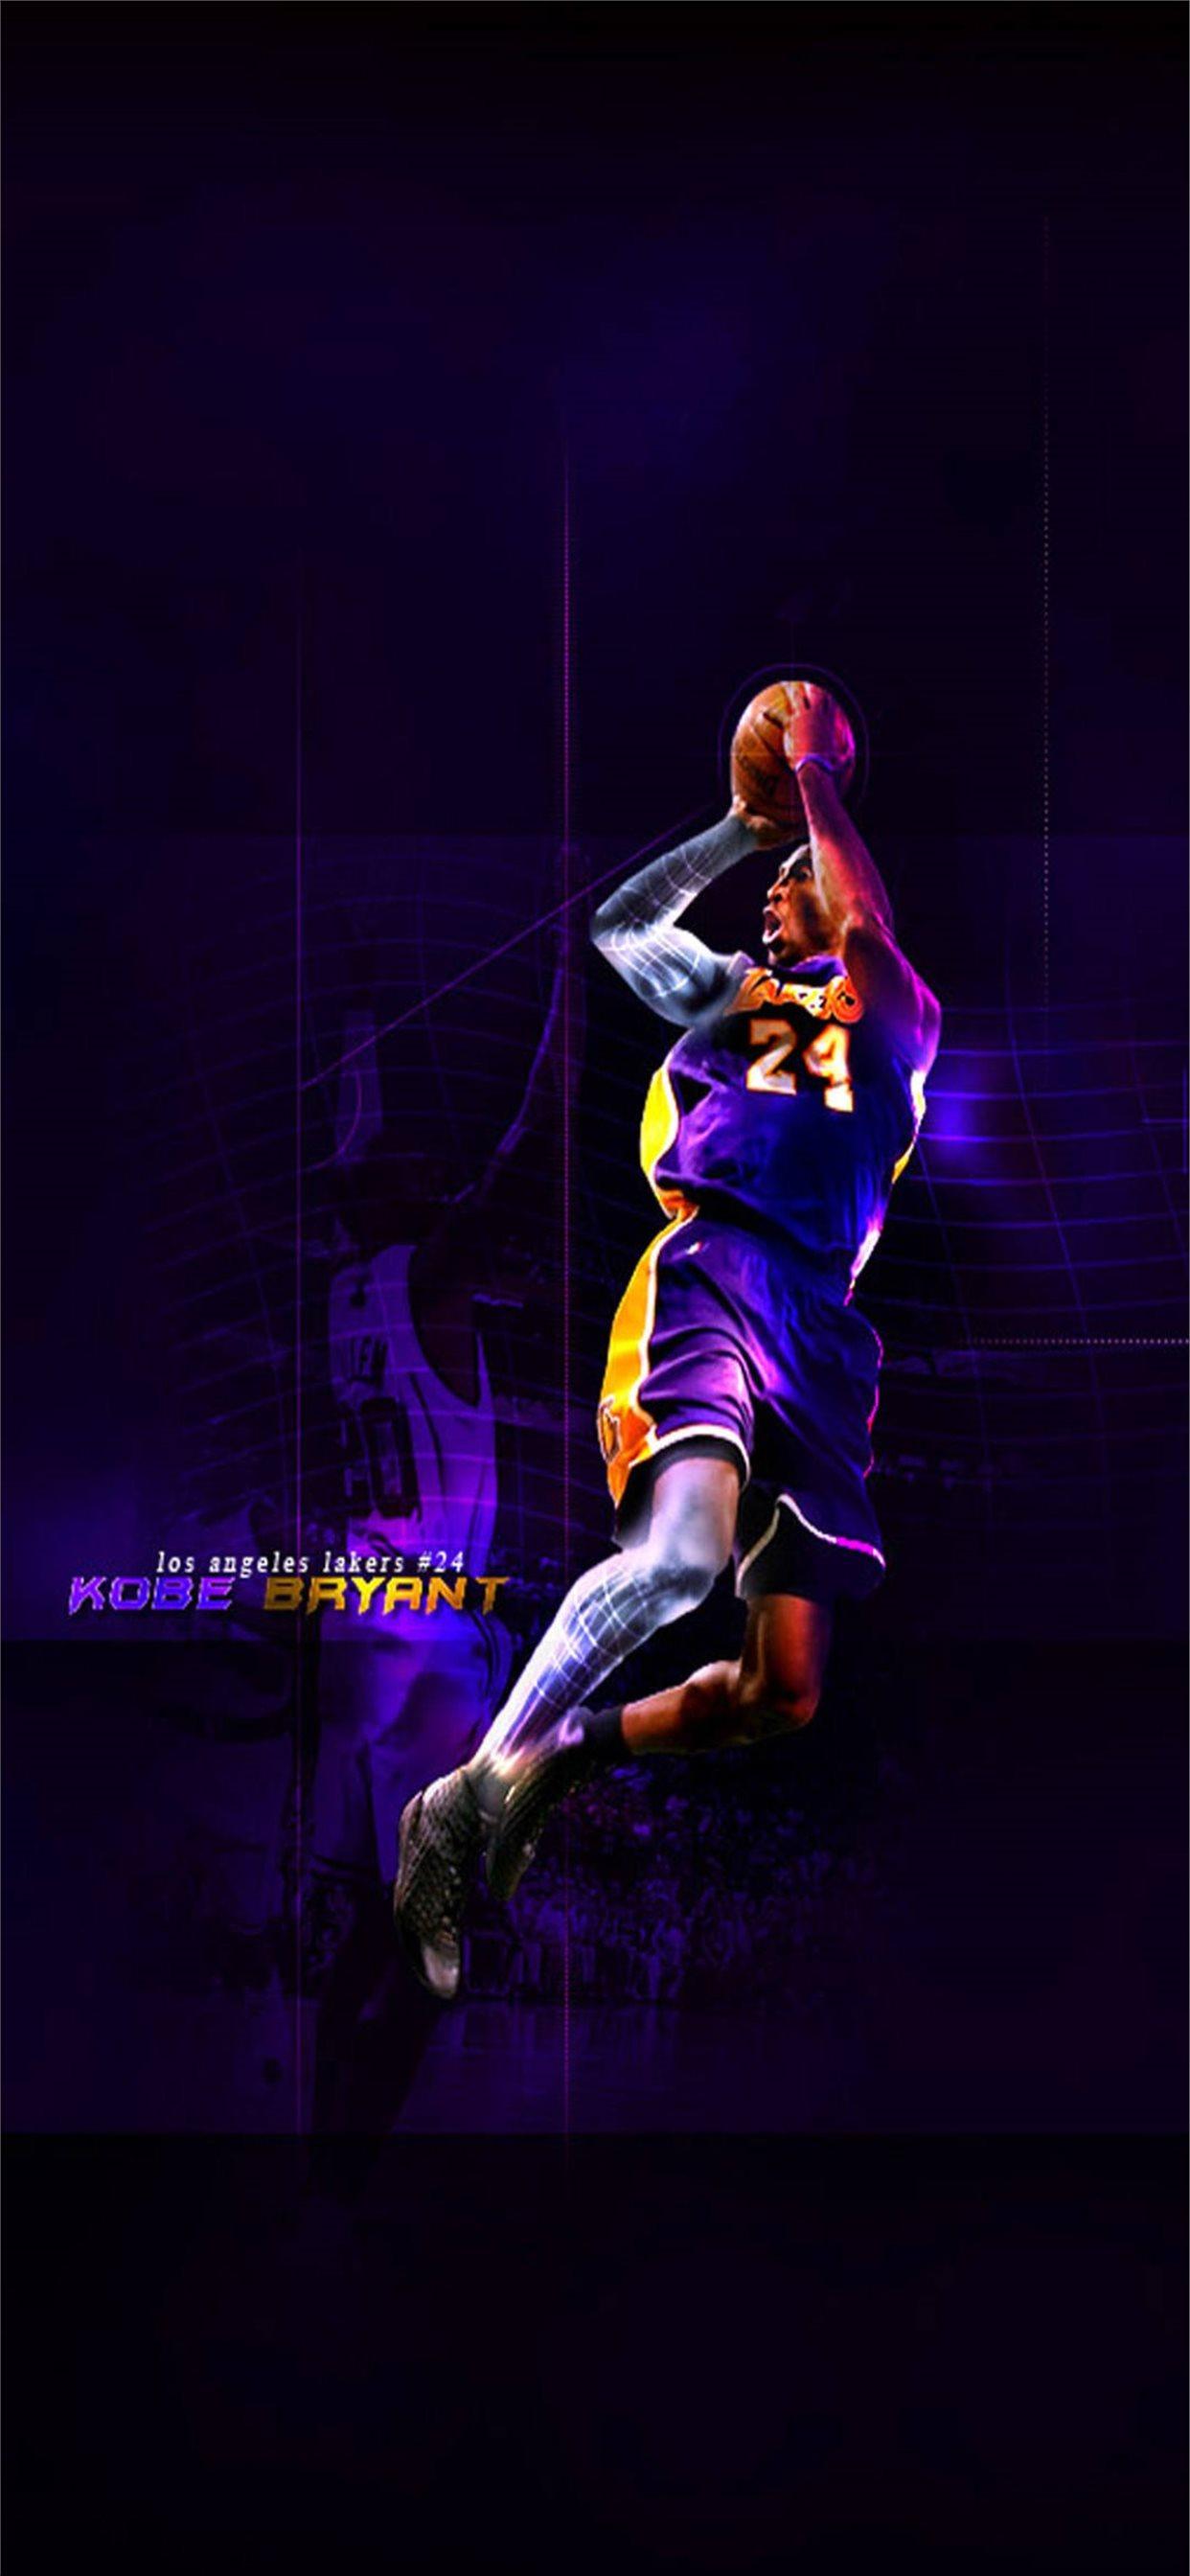 Kobe Bryant Iphone X Wallpapers Free Download